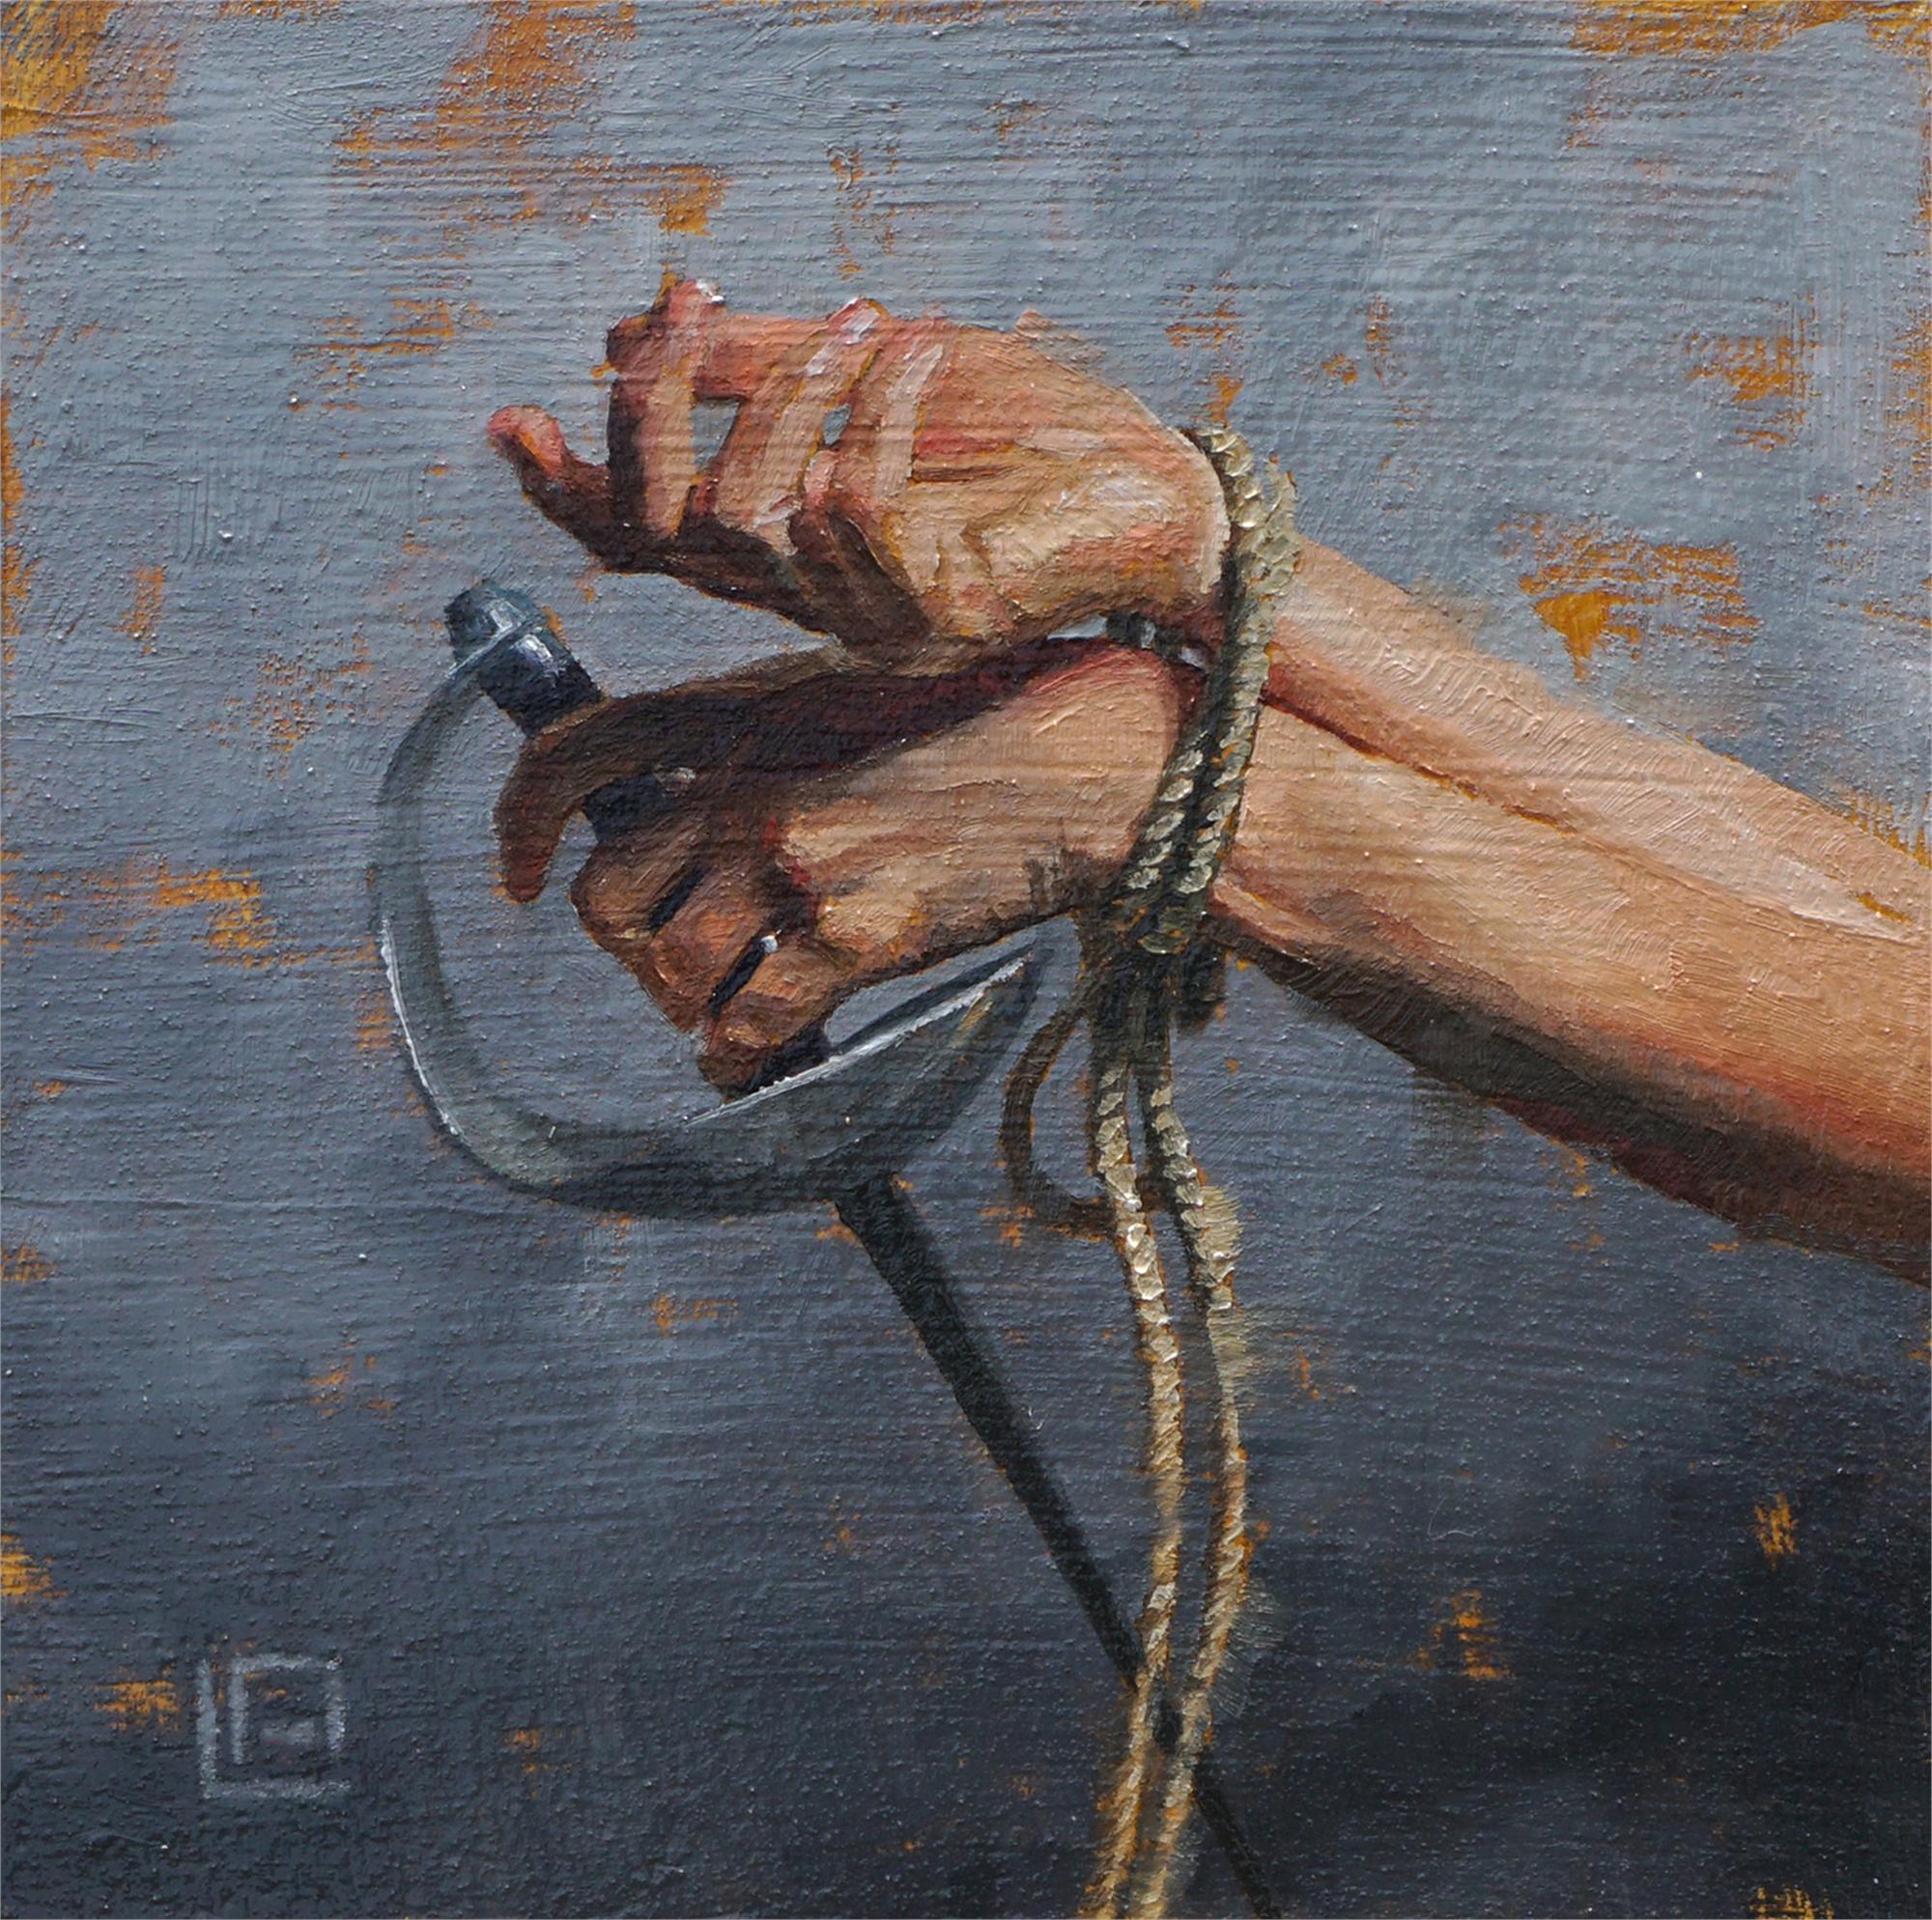 Hand Study 2 by Linda Adair